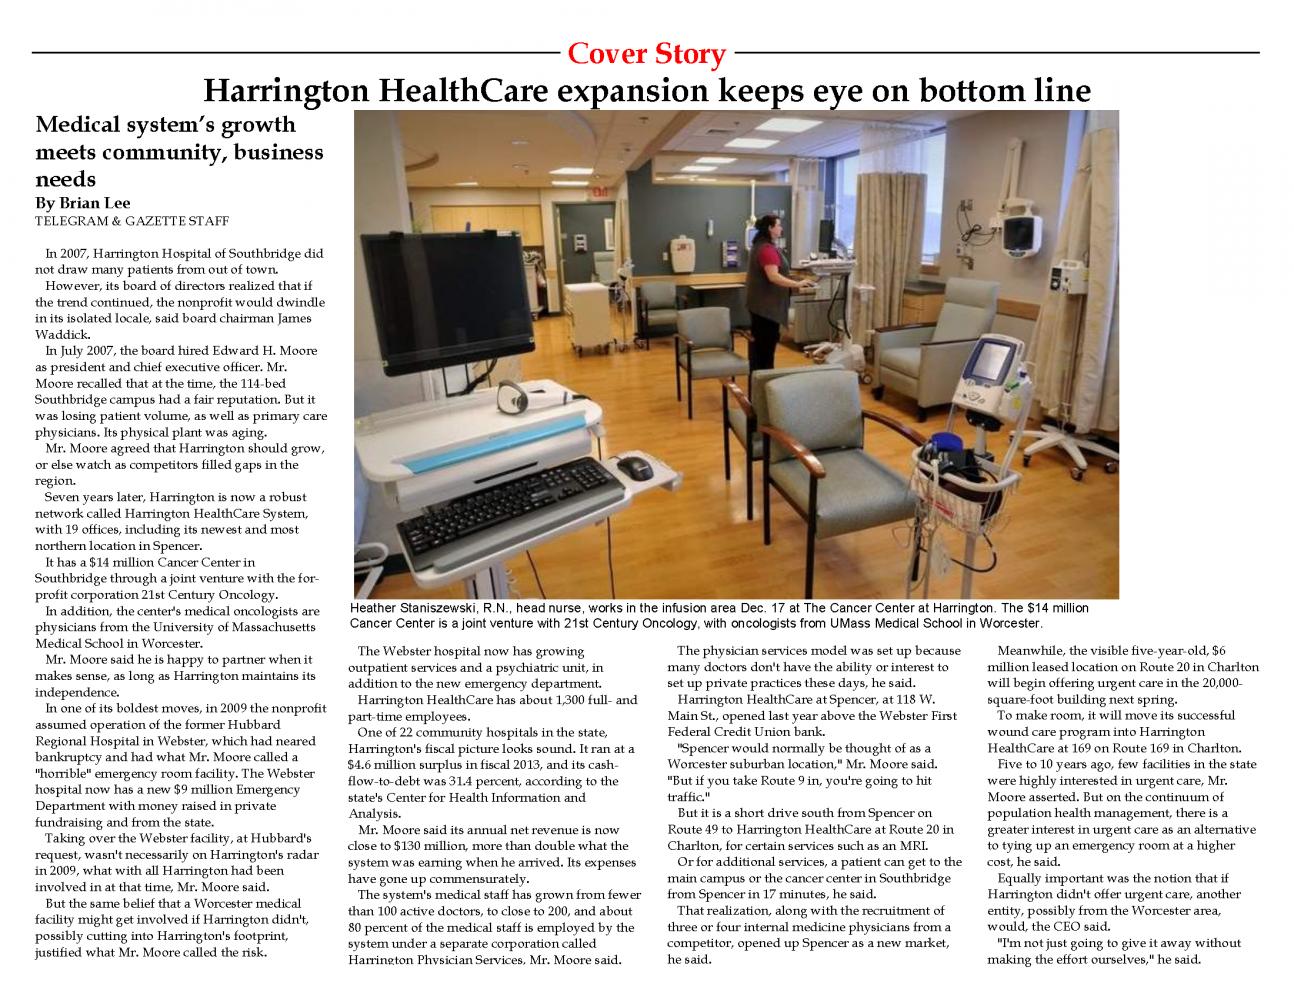 HH Telegram Cover Story - 12-21-14 pg. 1